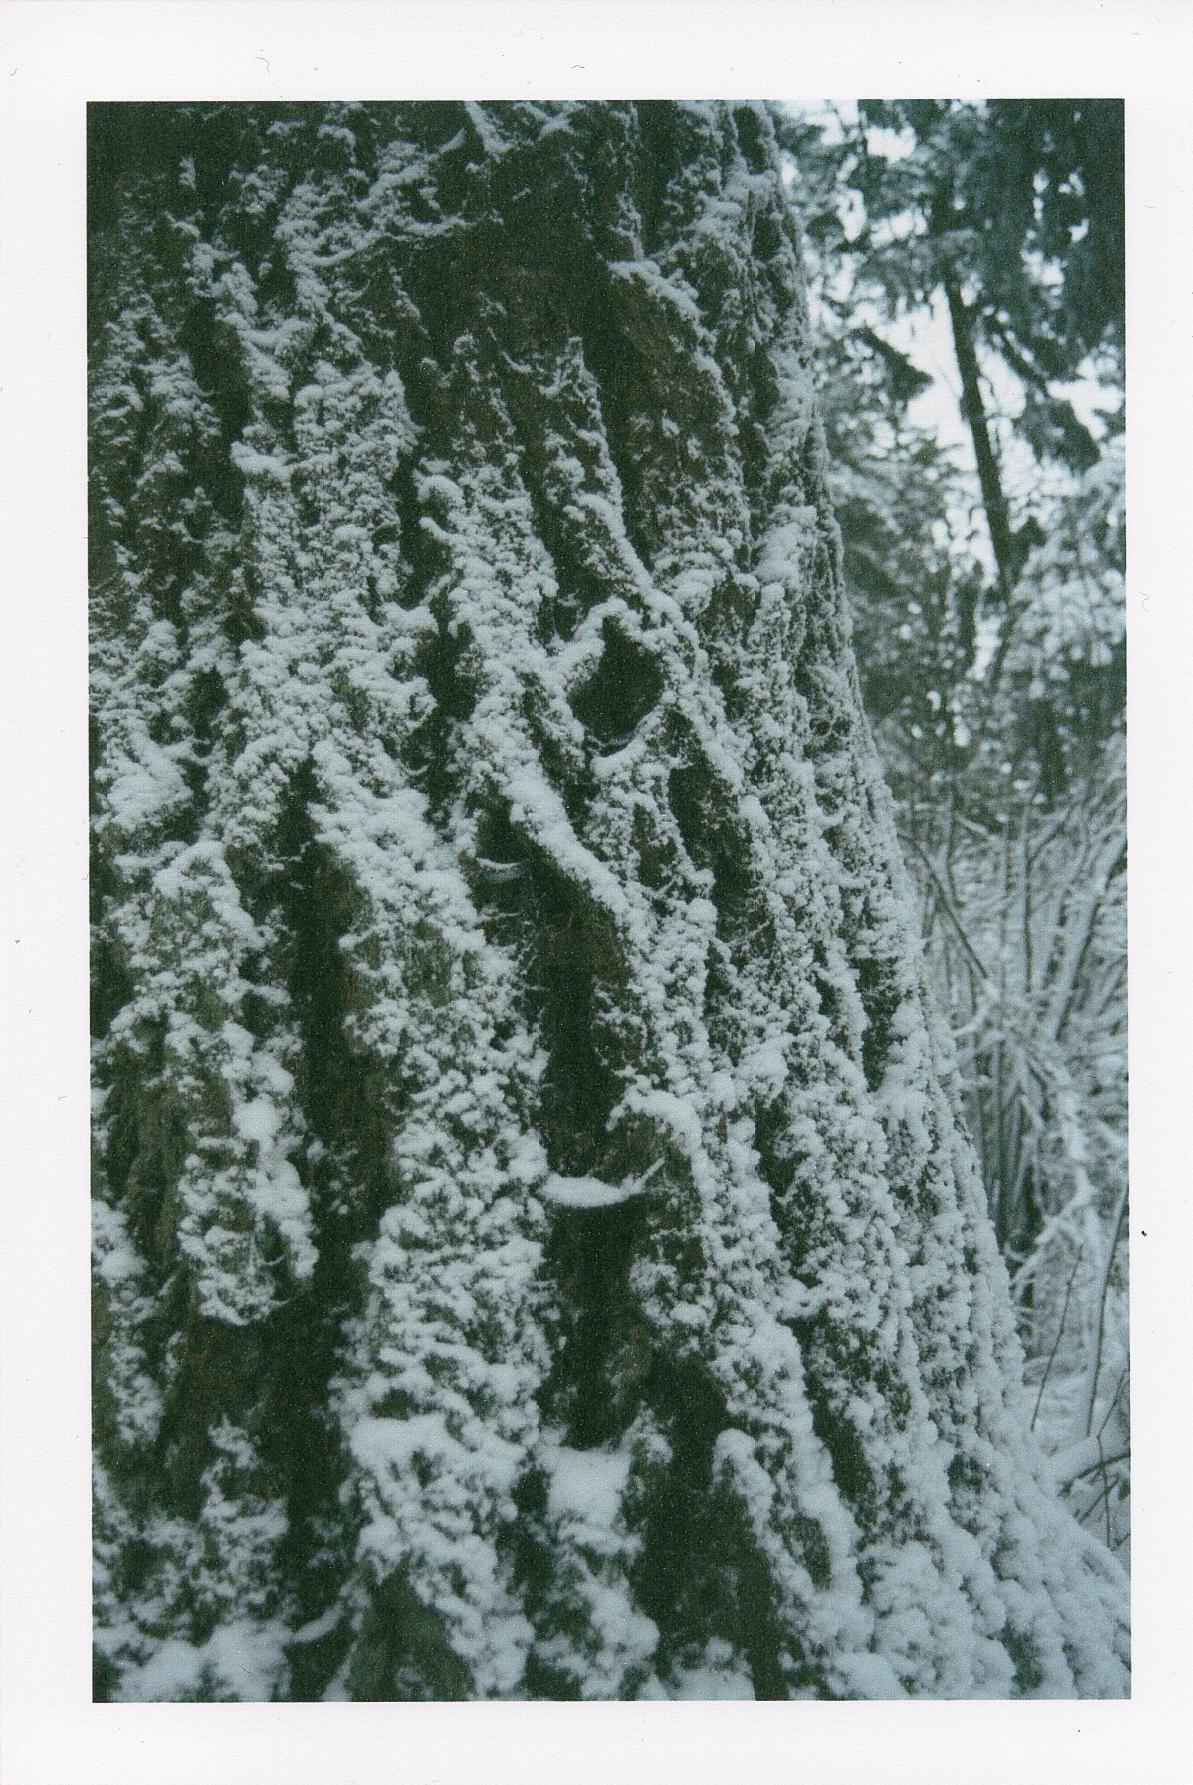 winterfilm-1.jpg